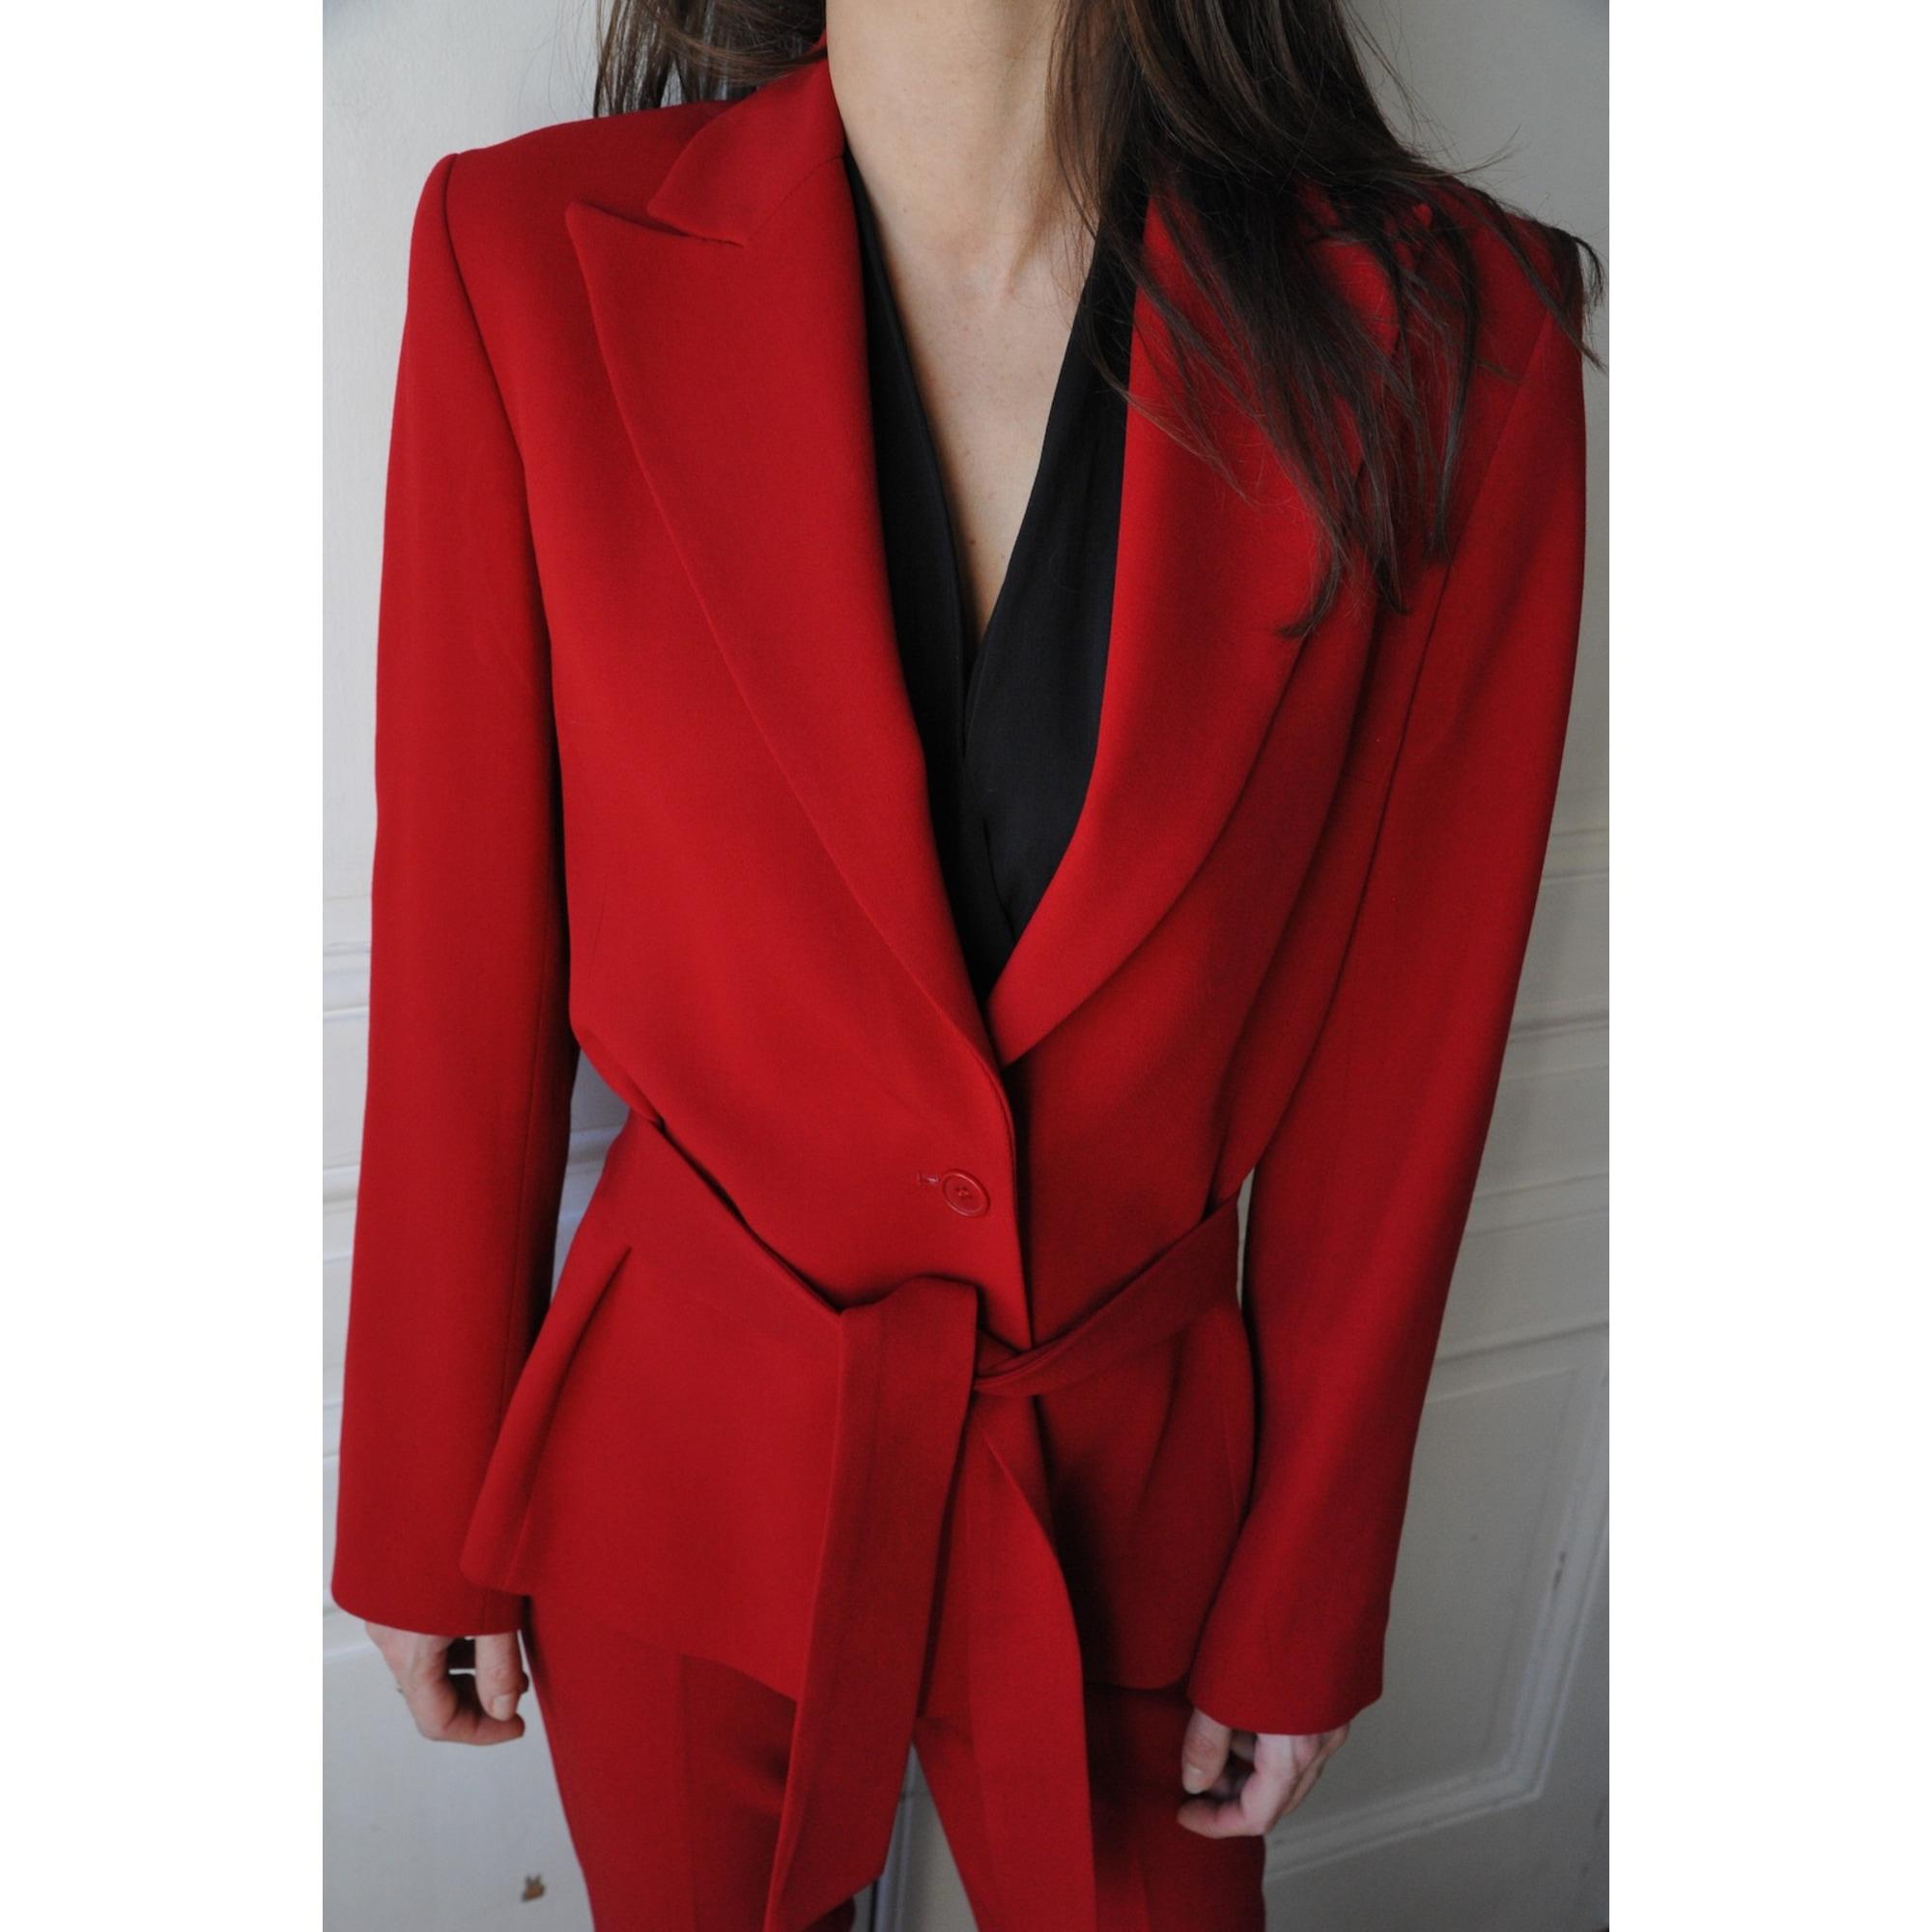 Tailleur pantalon ZARA 36 (S, T1) rouge vendu